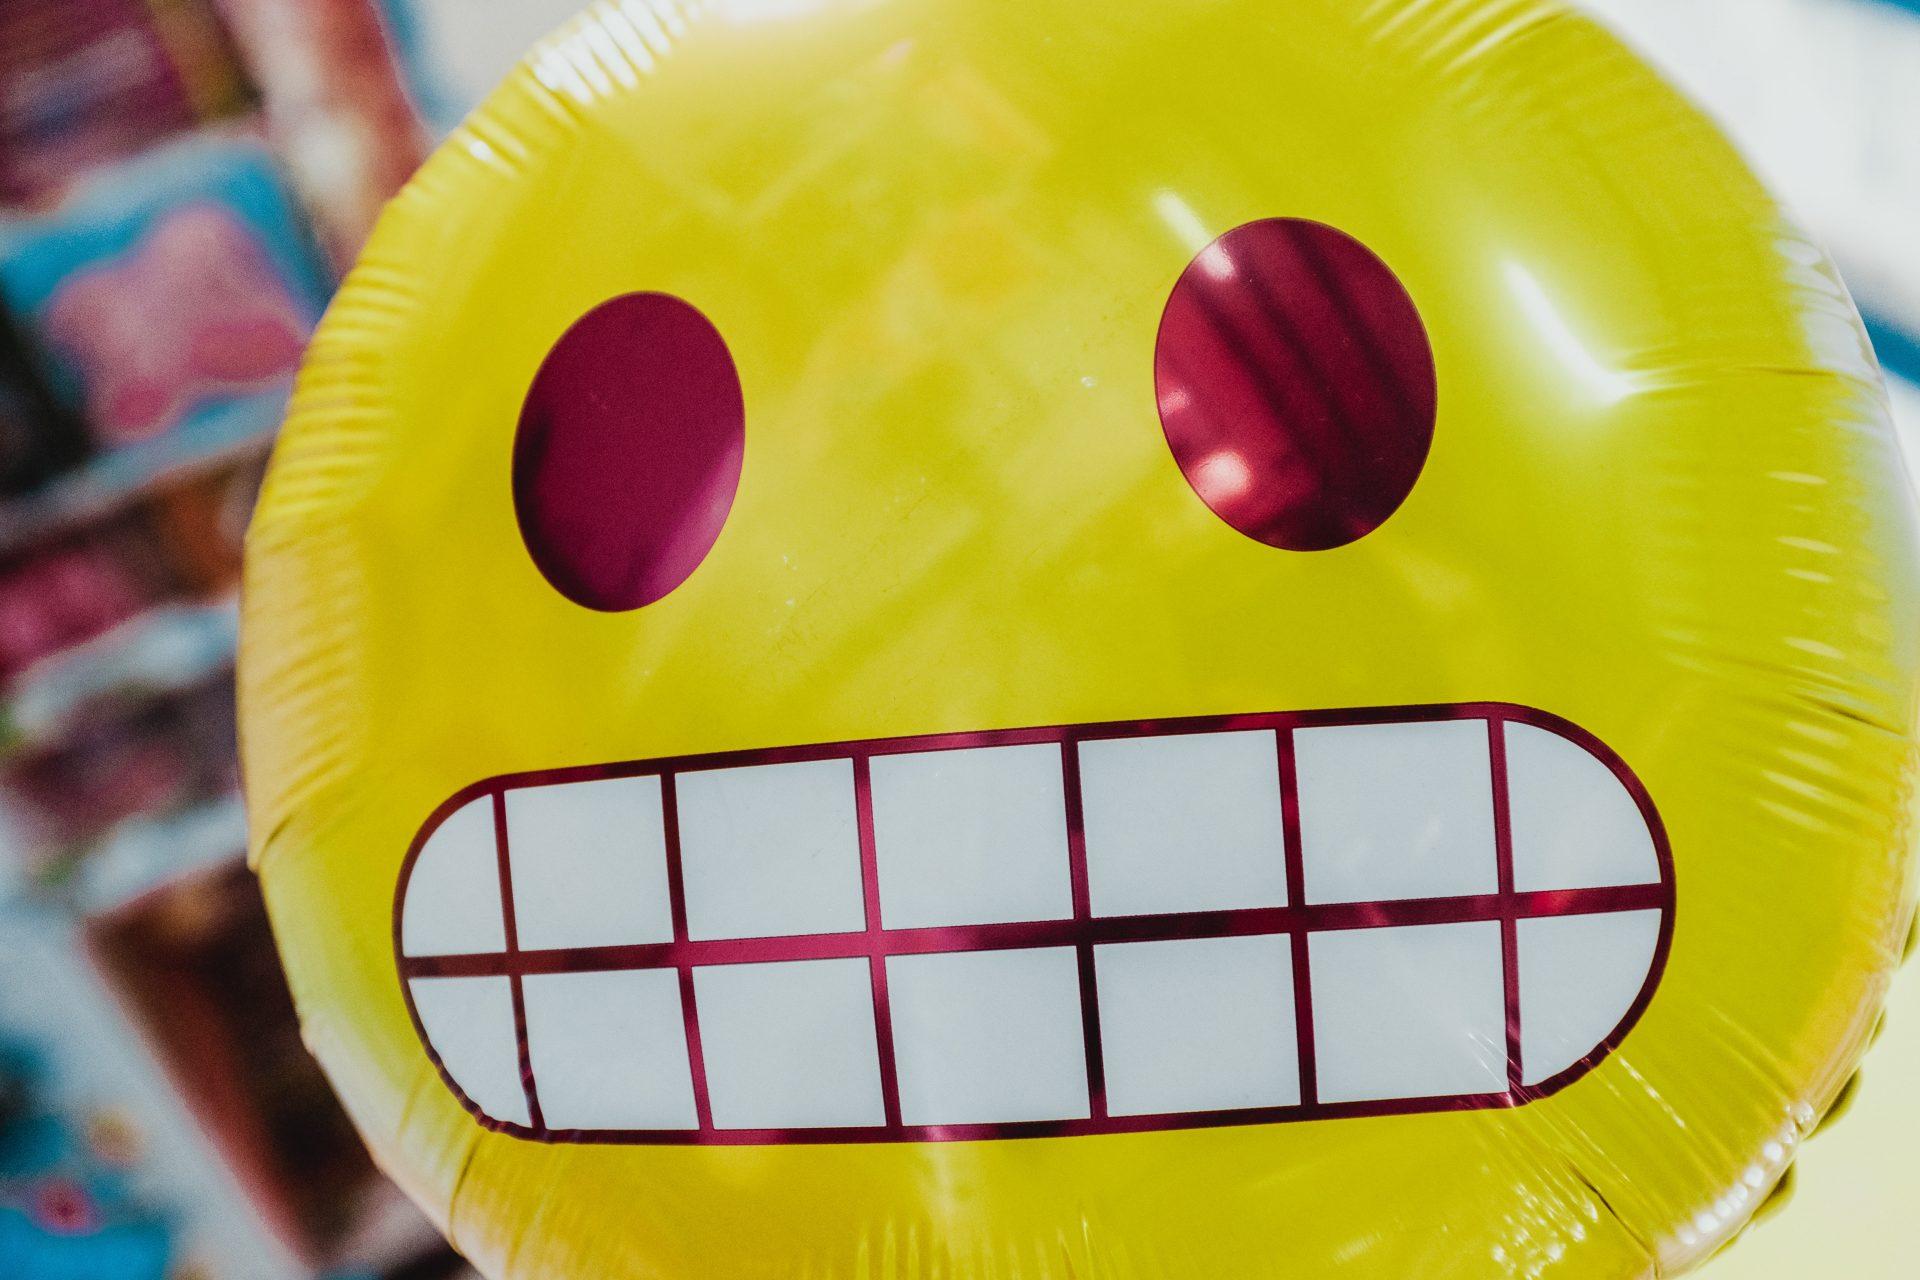 Balloon grimacing